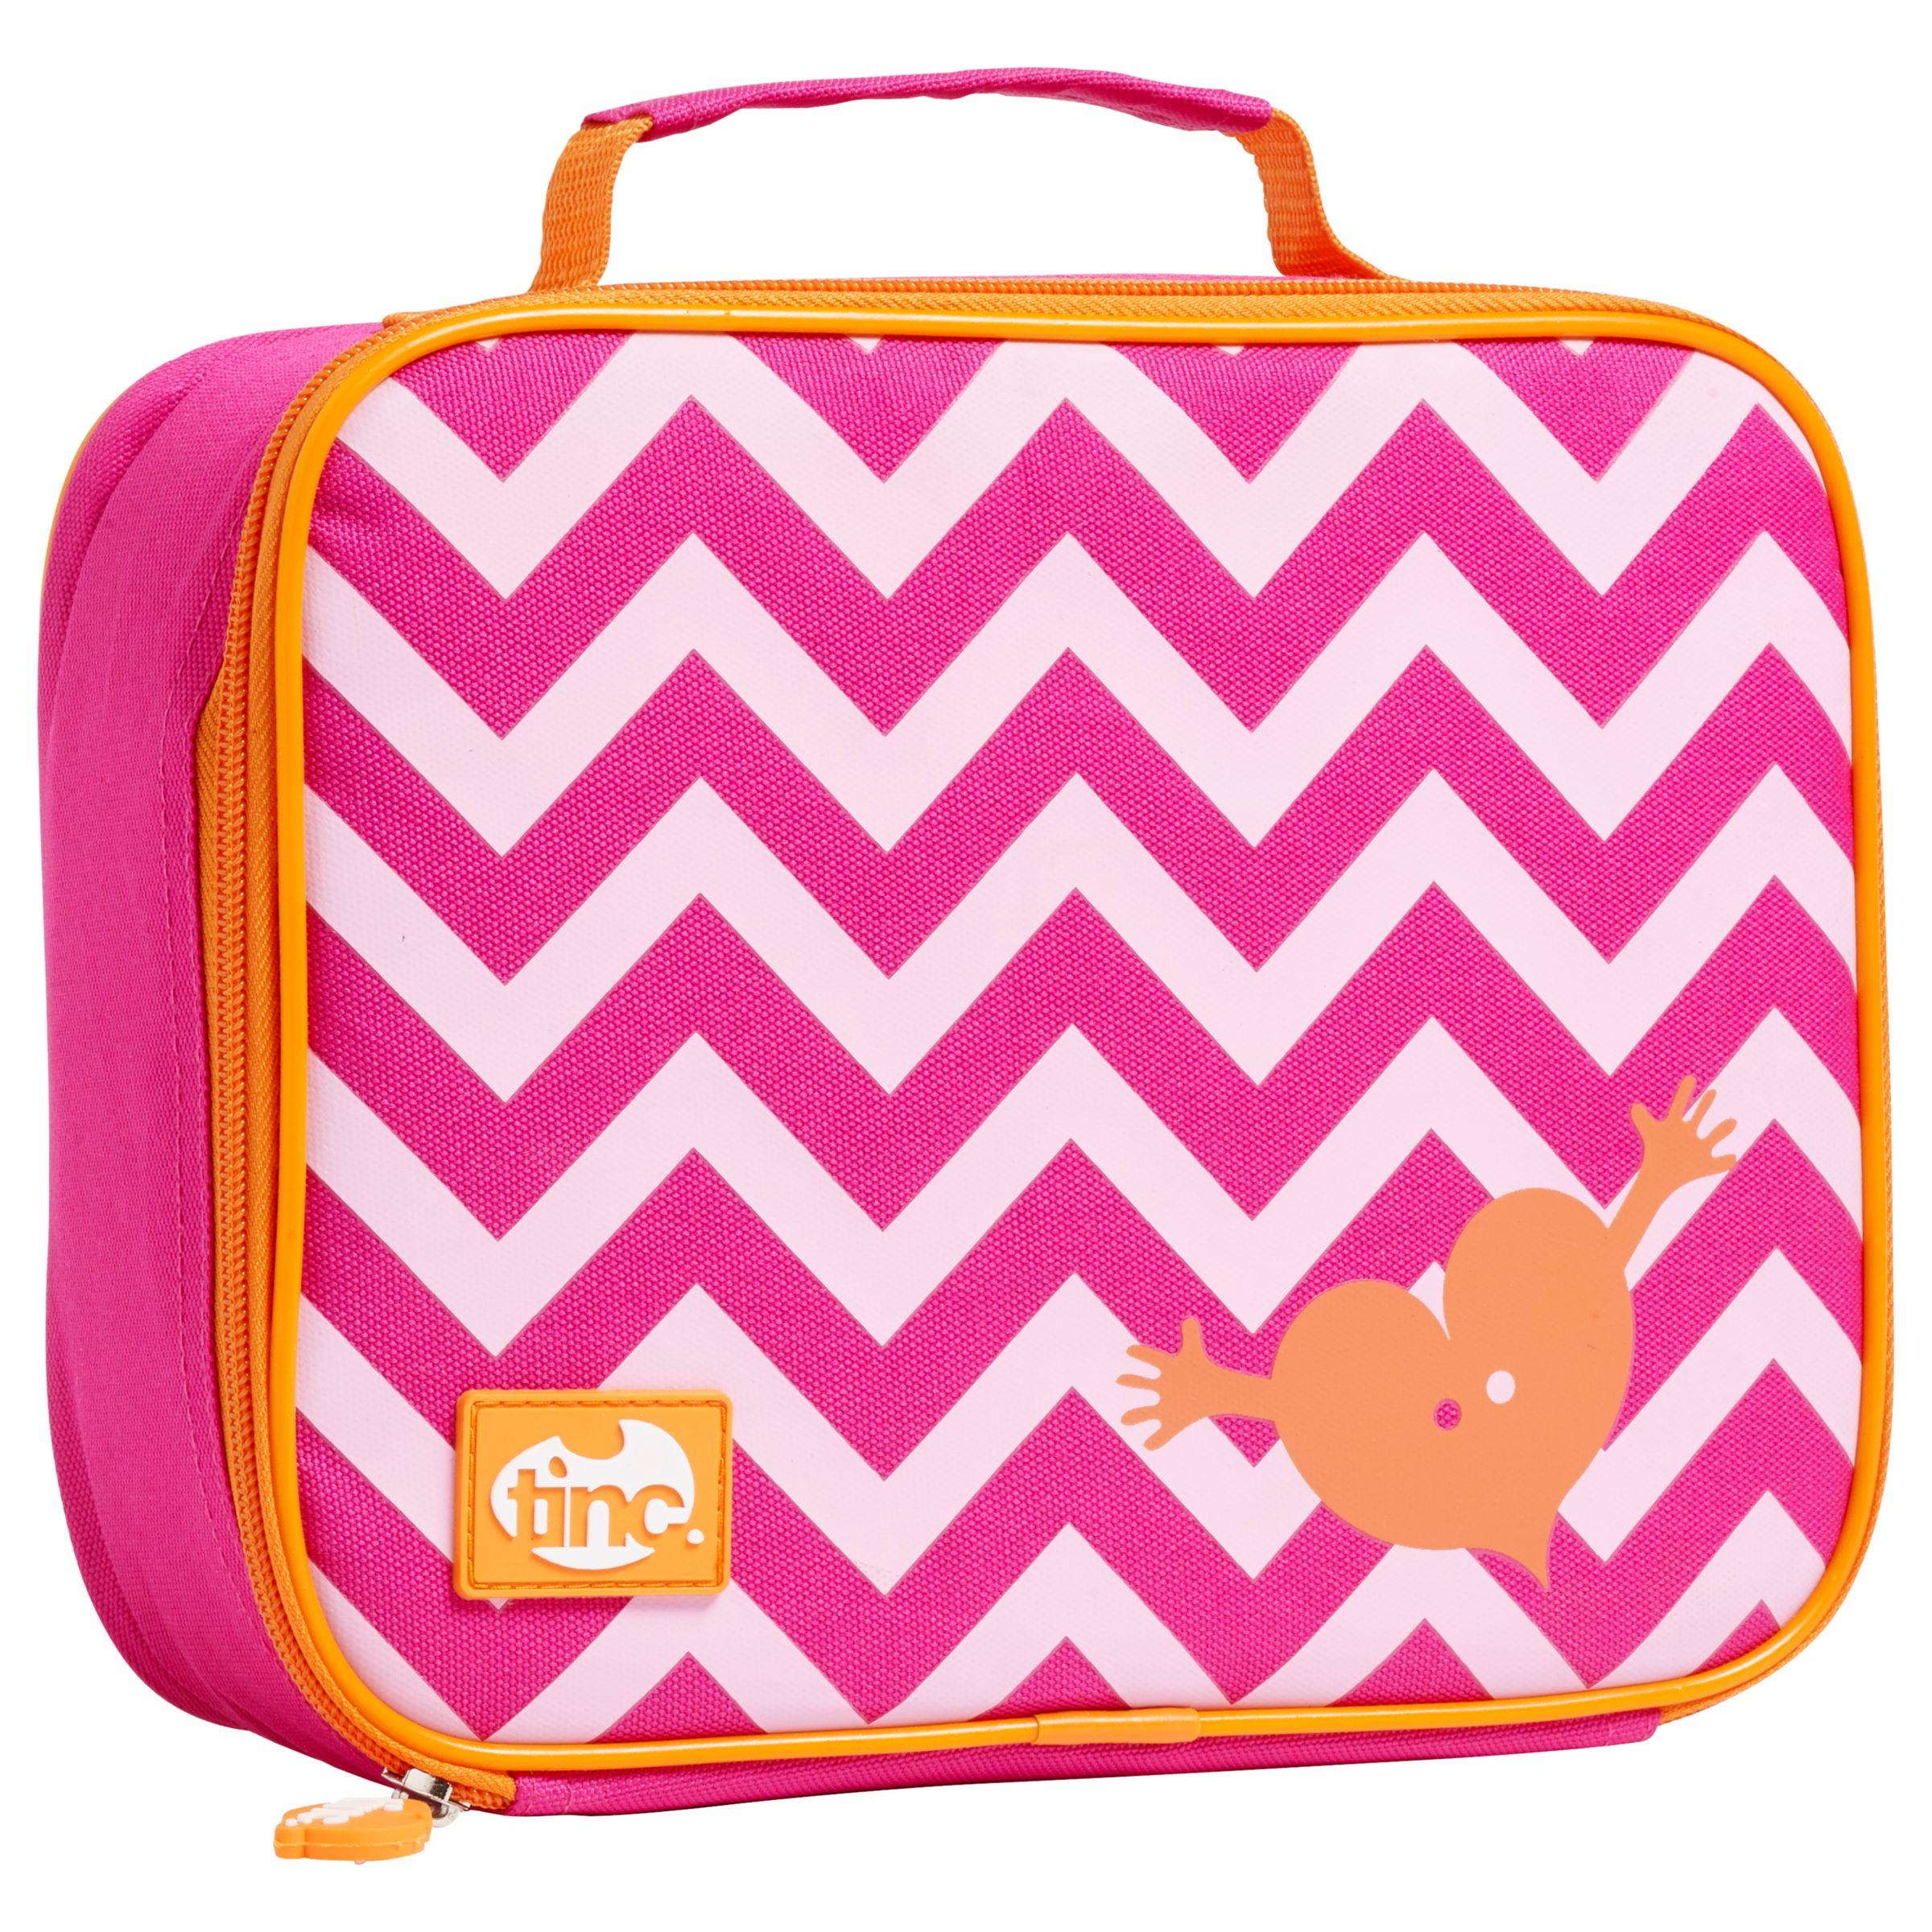 Tinc Tinc Geometric Lunchbox, Pink / Orange